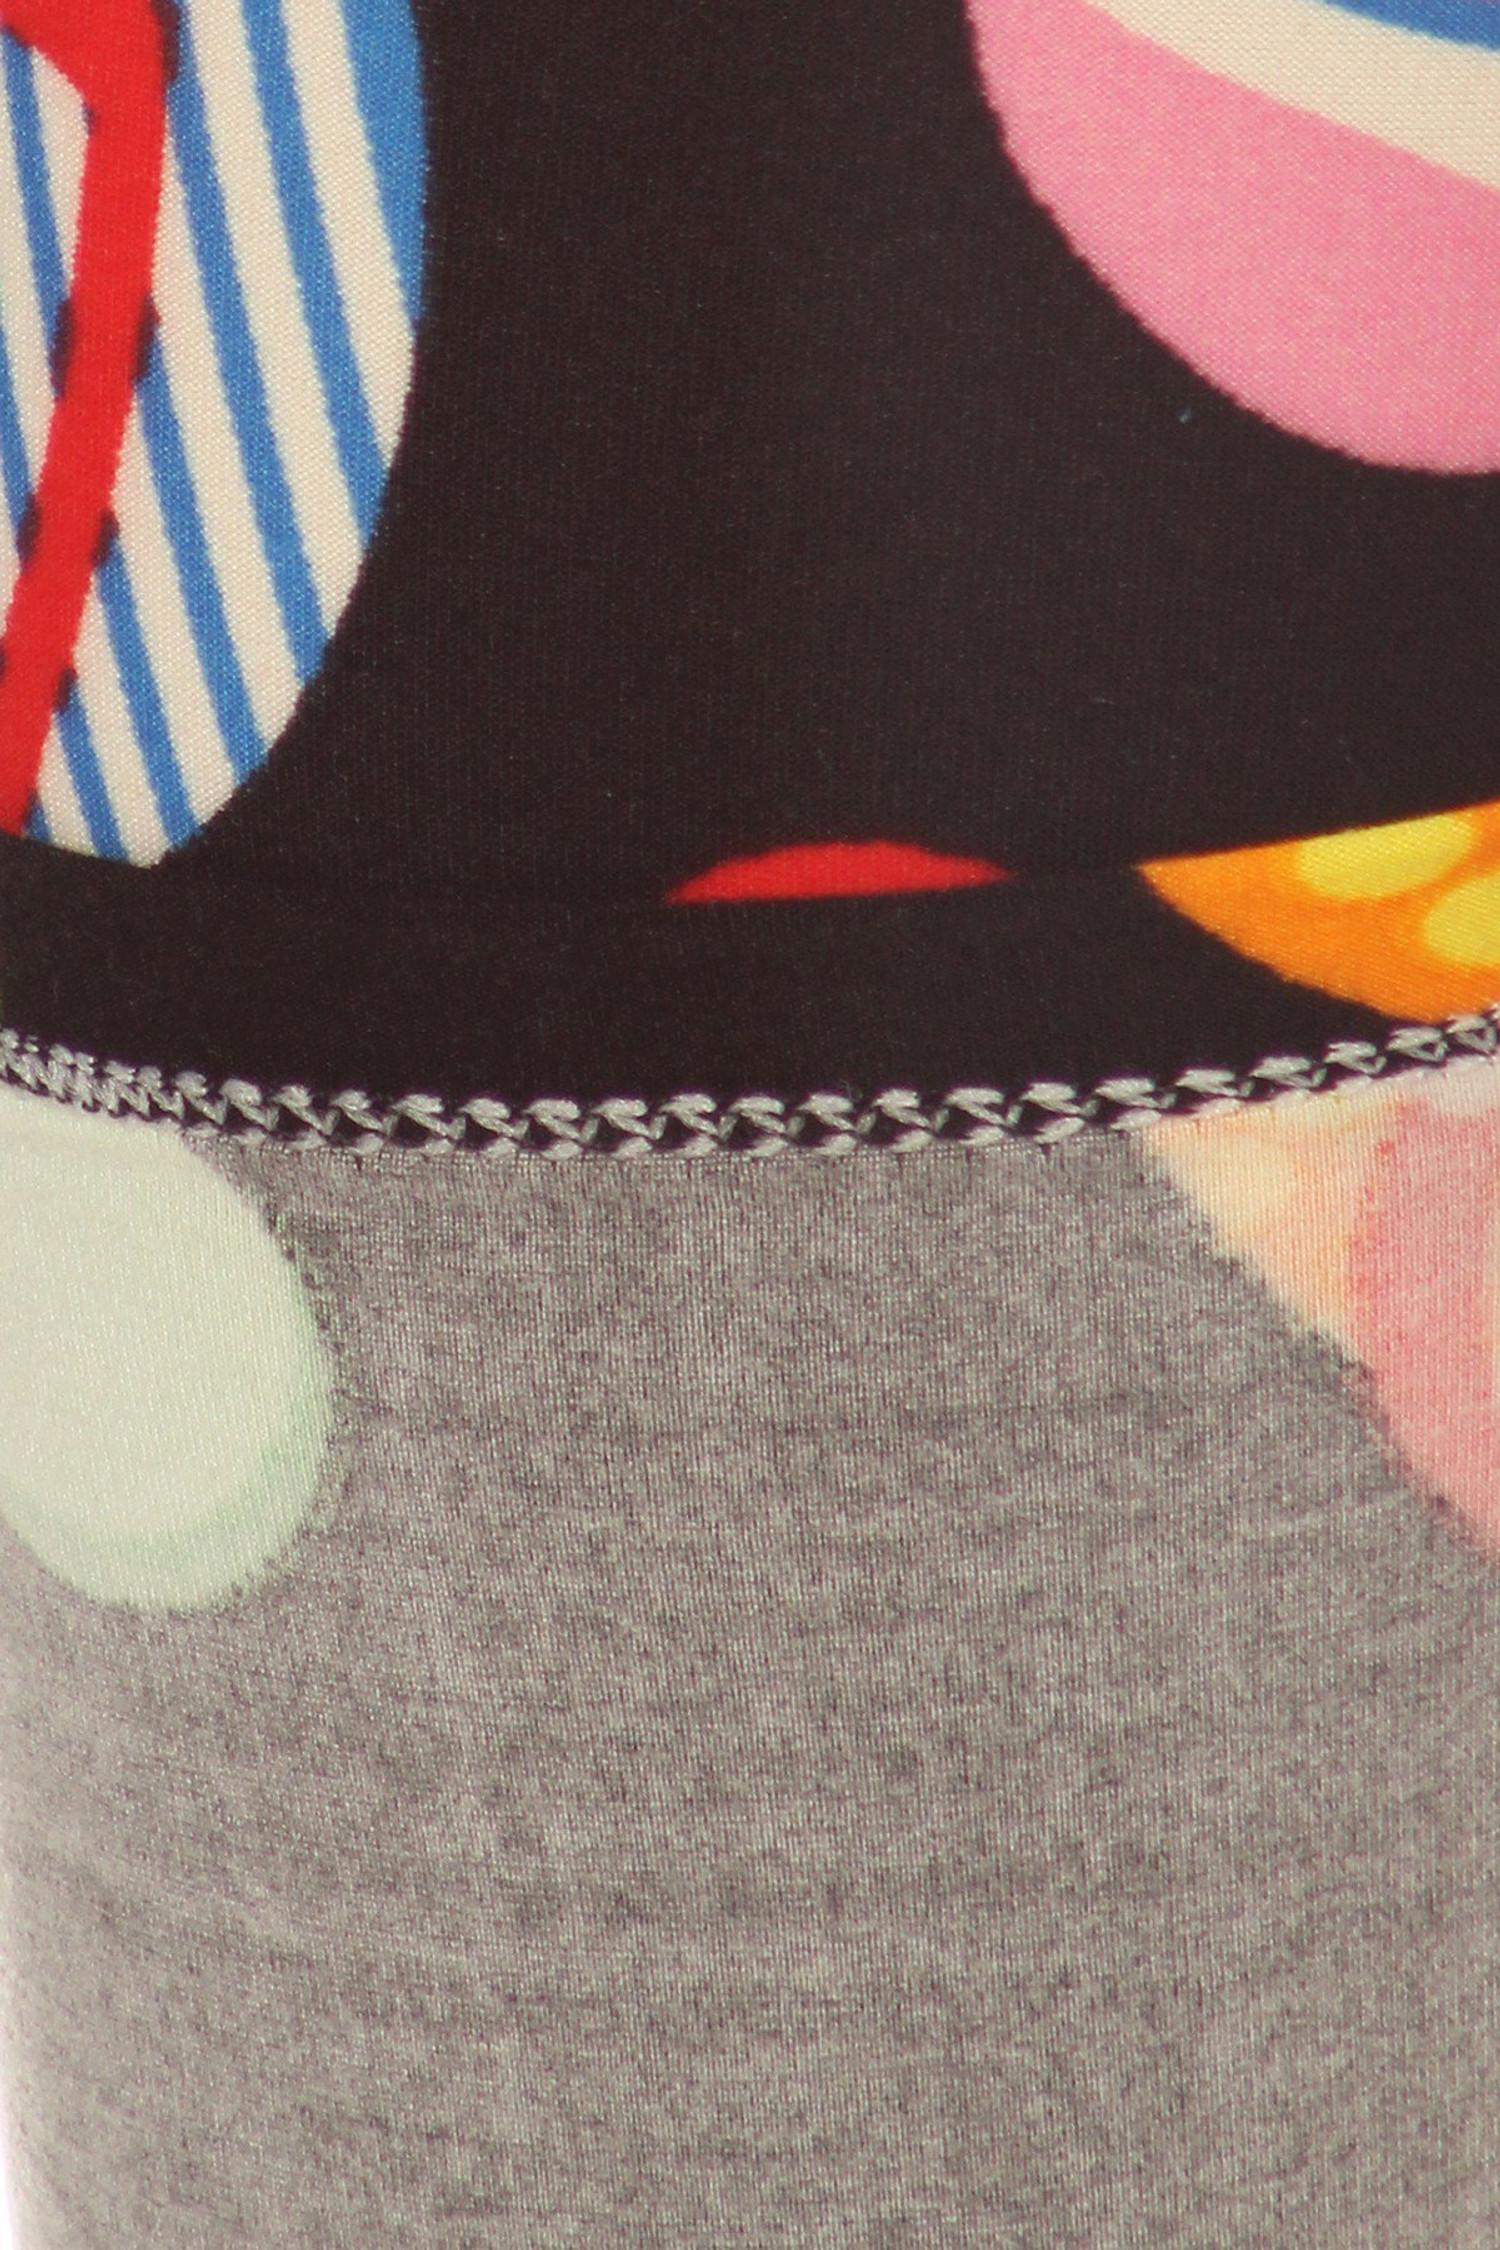 Soft Brushed Jumbo Beach Sandals Plus Size Leggings - 3X-5X